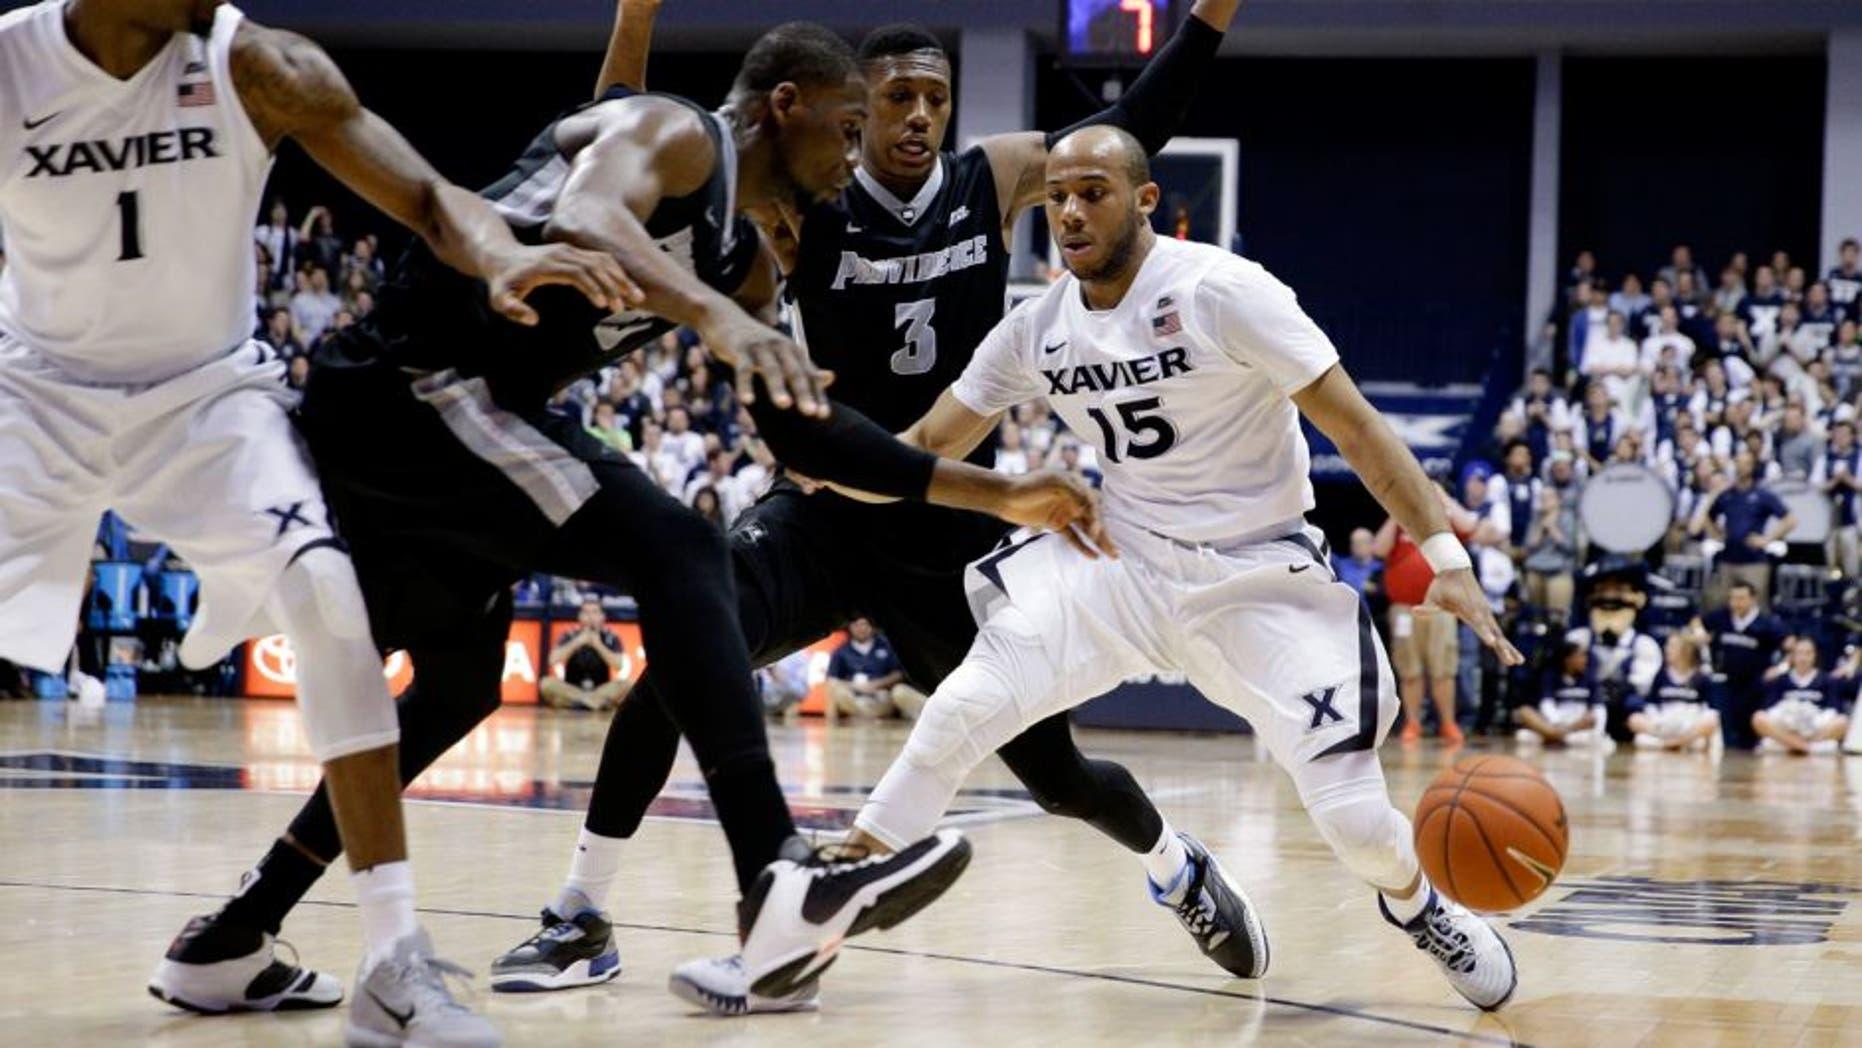 Xavier's Myles Davis (15) drives against Providence's Kris Dunn (3) and Kris Dunn, second from left, during the second half of an NCAA college basketball game Wednesday, Feb. 17, 2016, in Cincinnati. Xavier won 85-74. (AP Photo/John Minchillo)